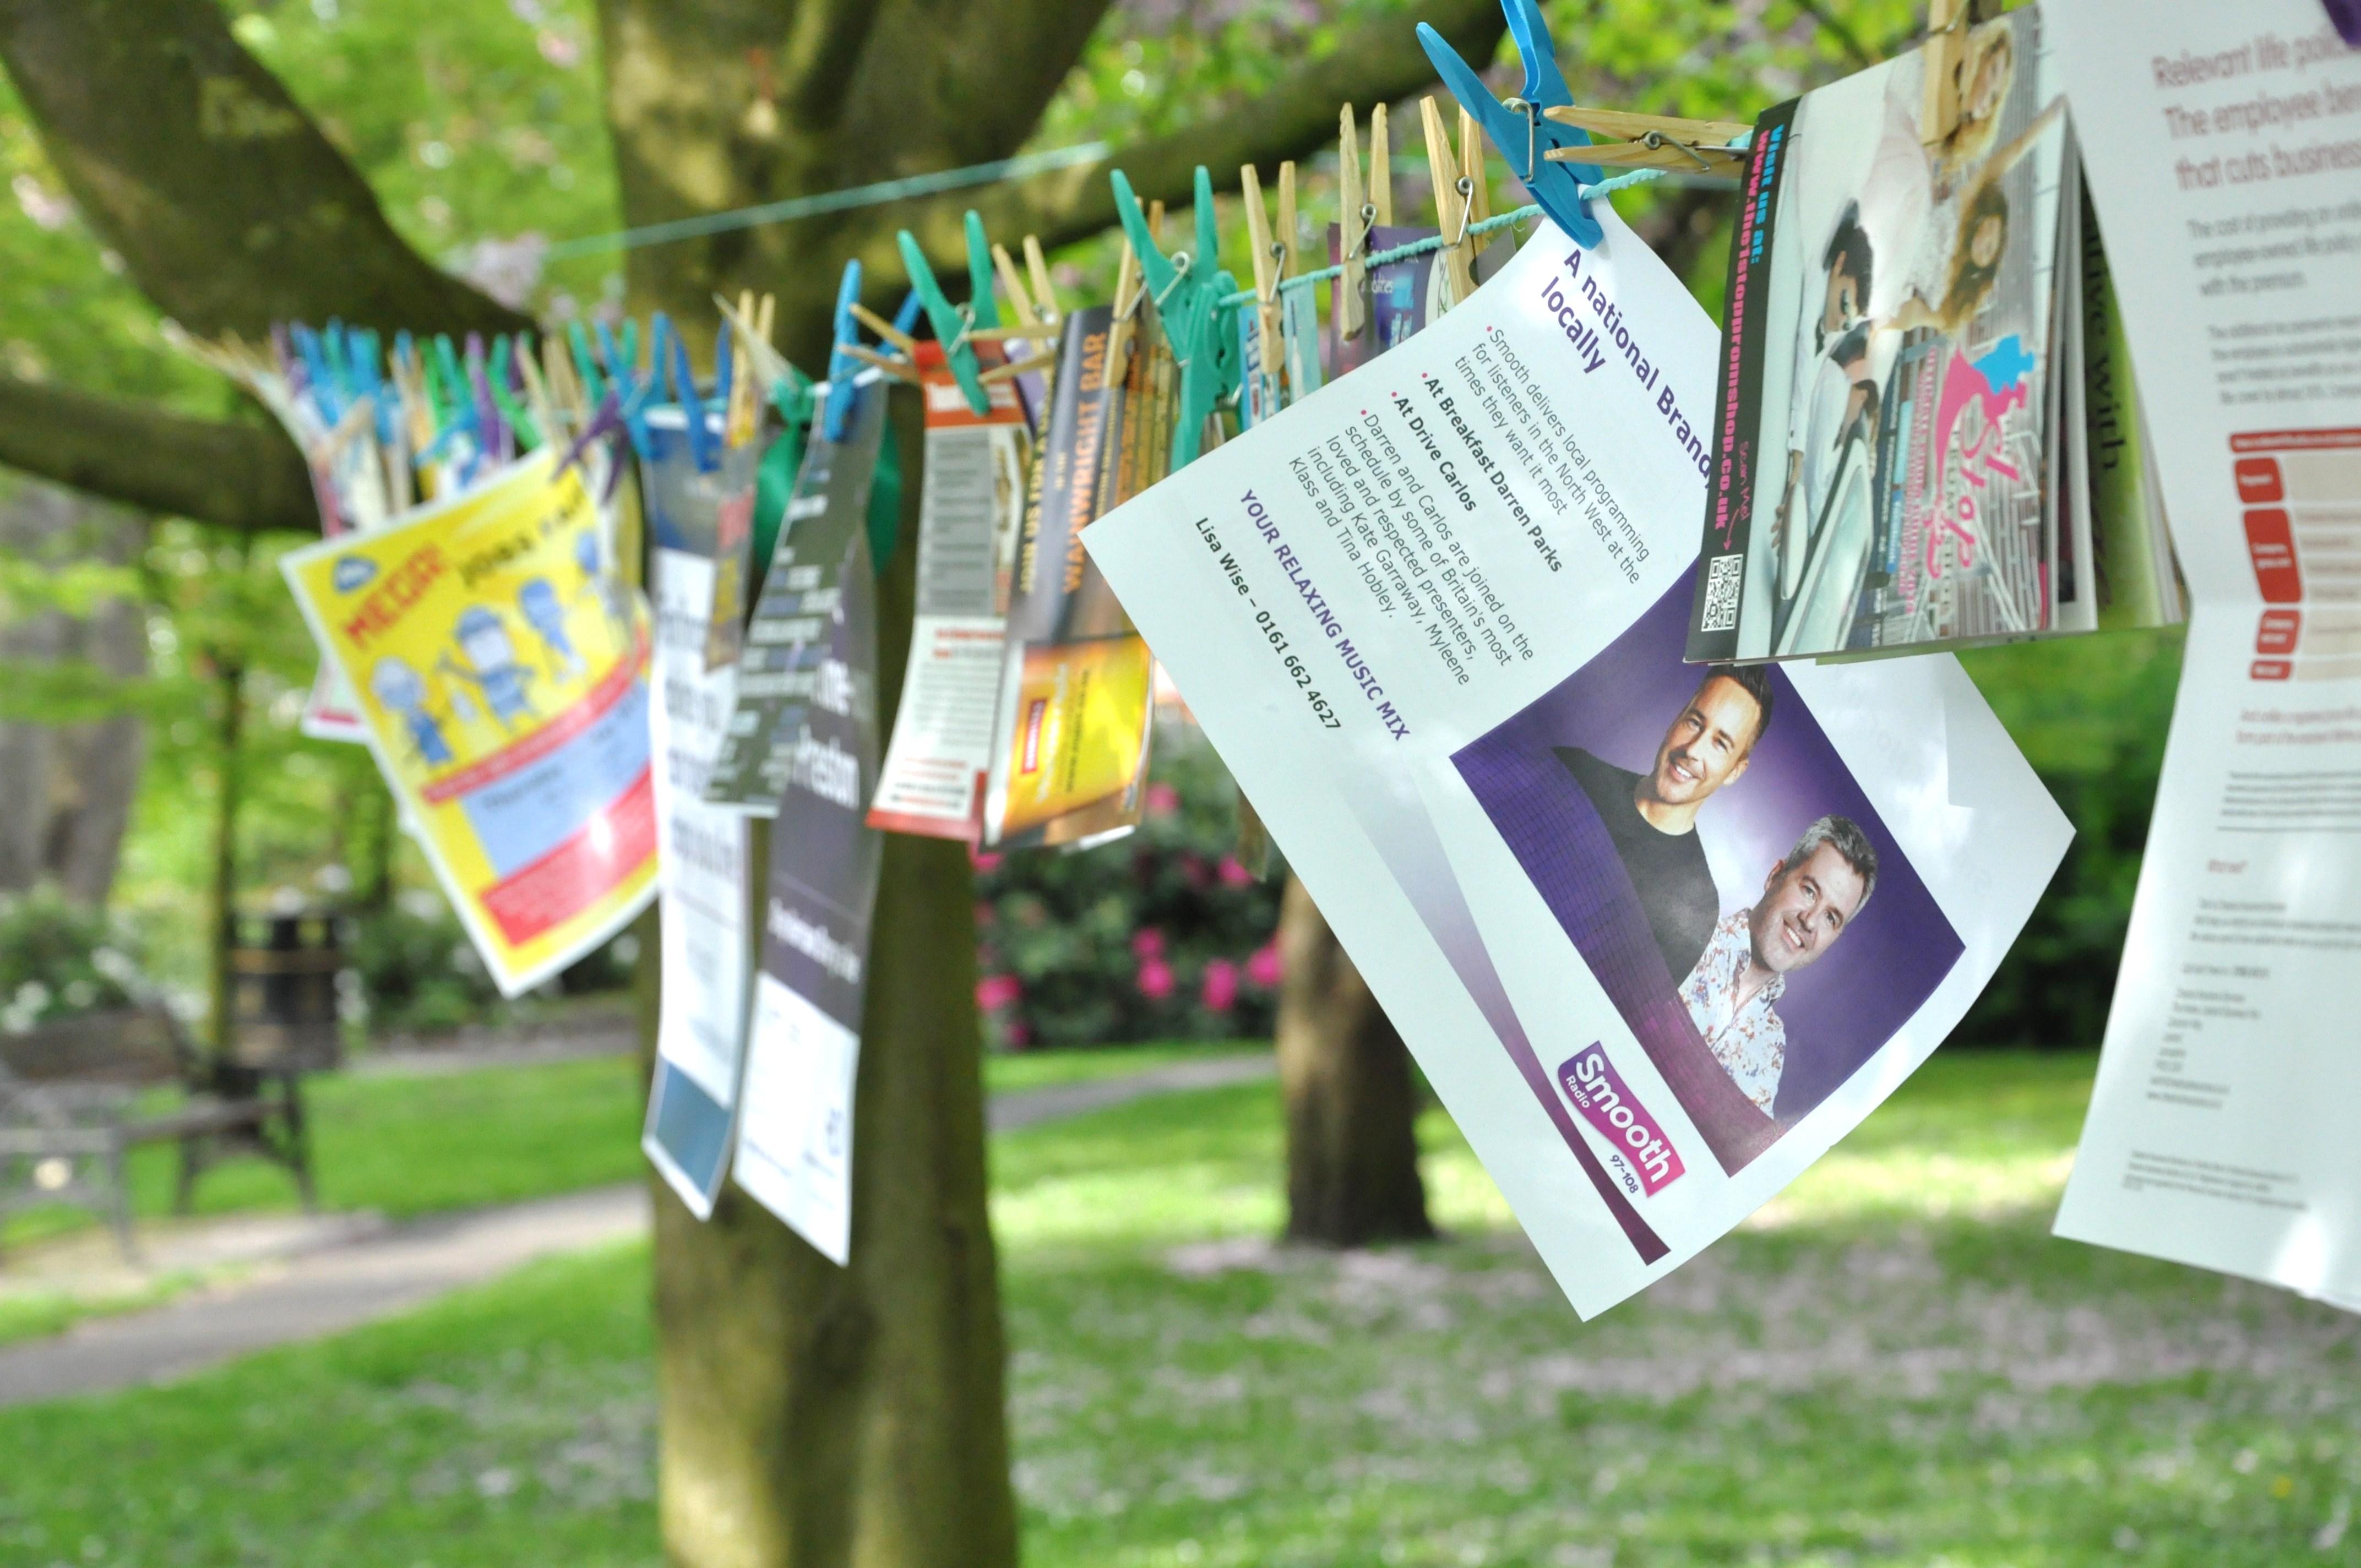 Business Hangout returns to Winckley Square | Blog Preston